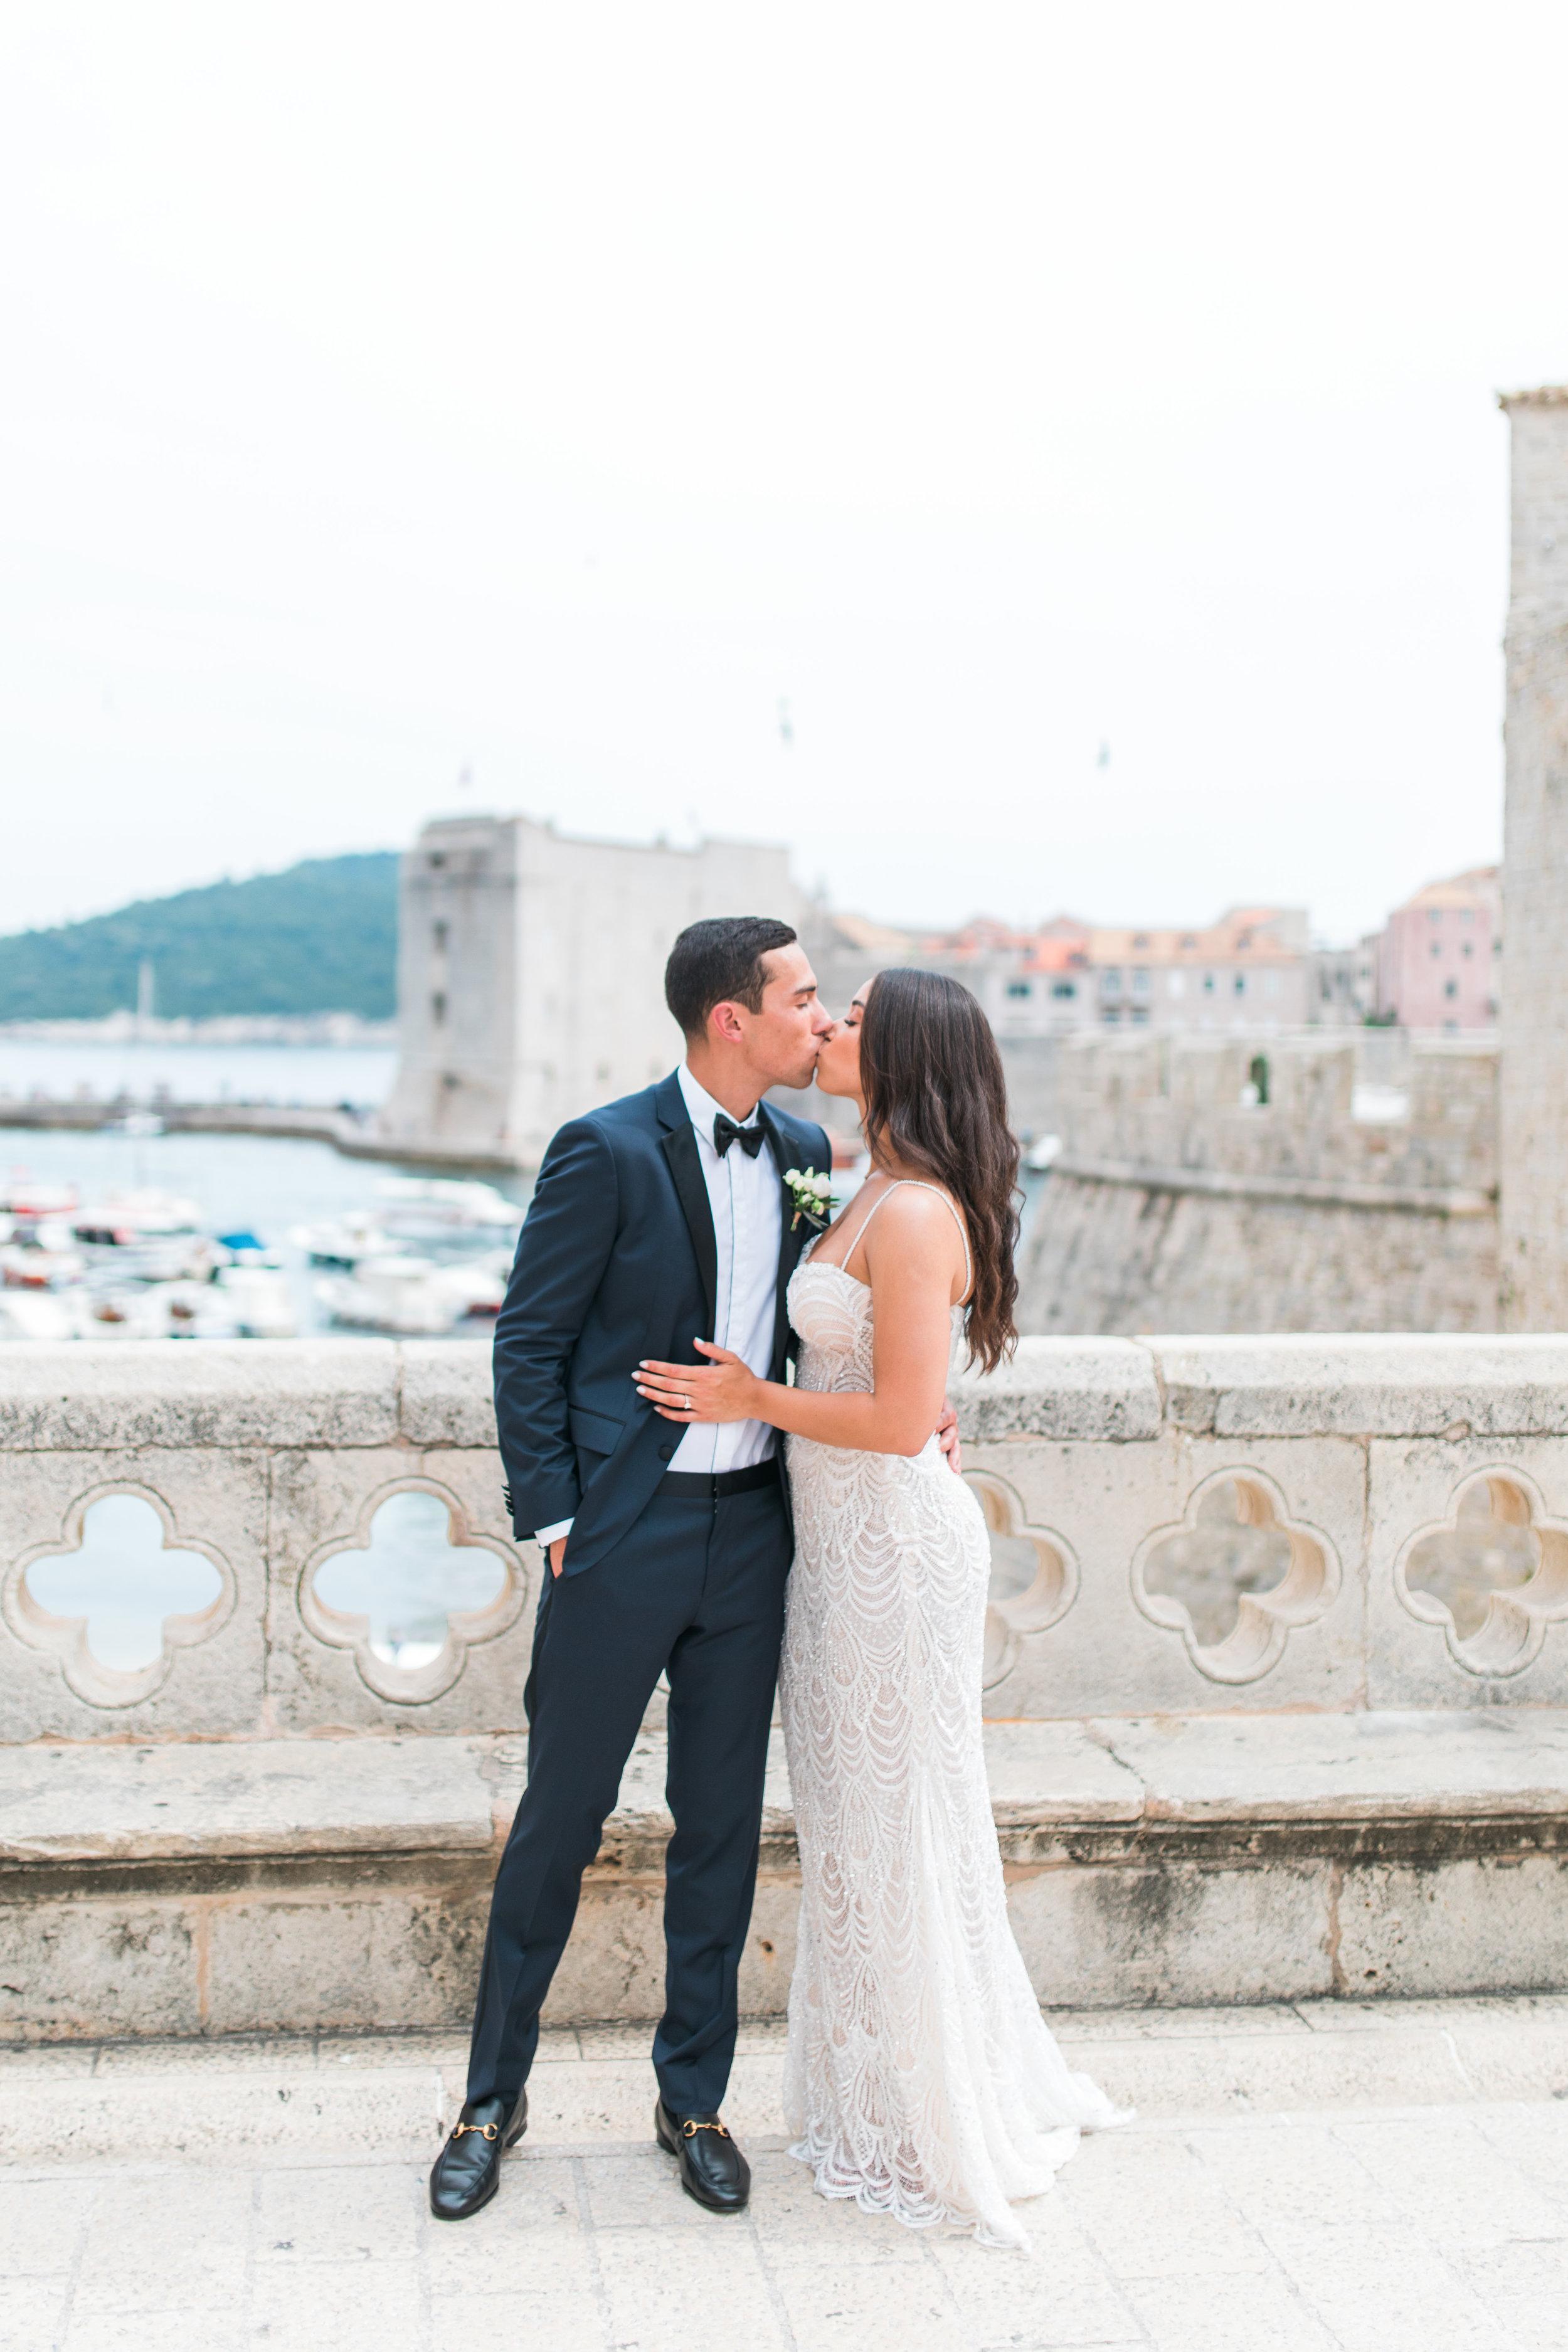 Dubrovnik-Wedding-Photographer-Croatia-Wedding-Photos-JBJ-Pictures-16.jpg